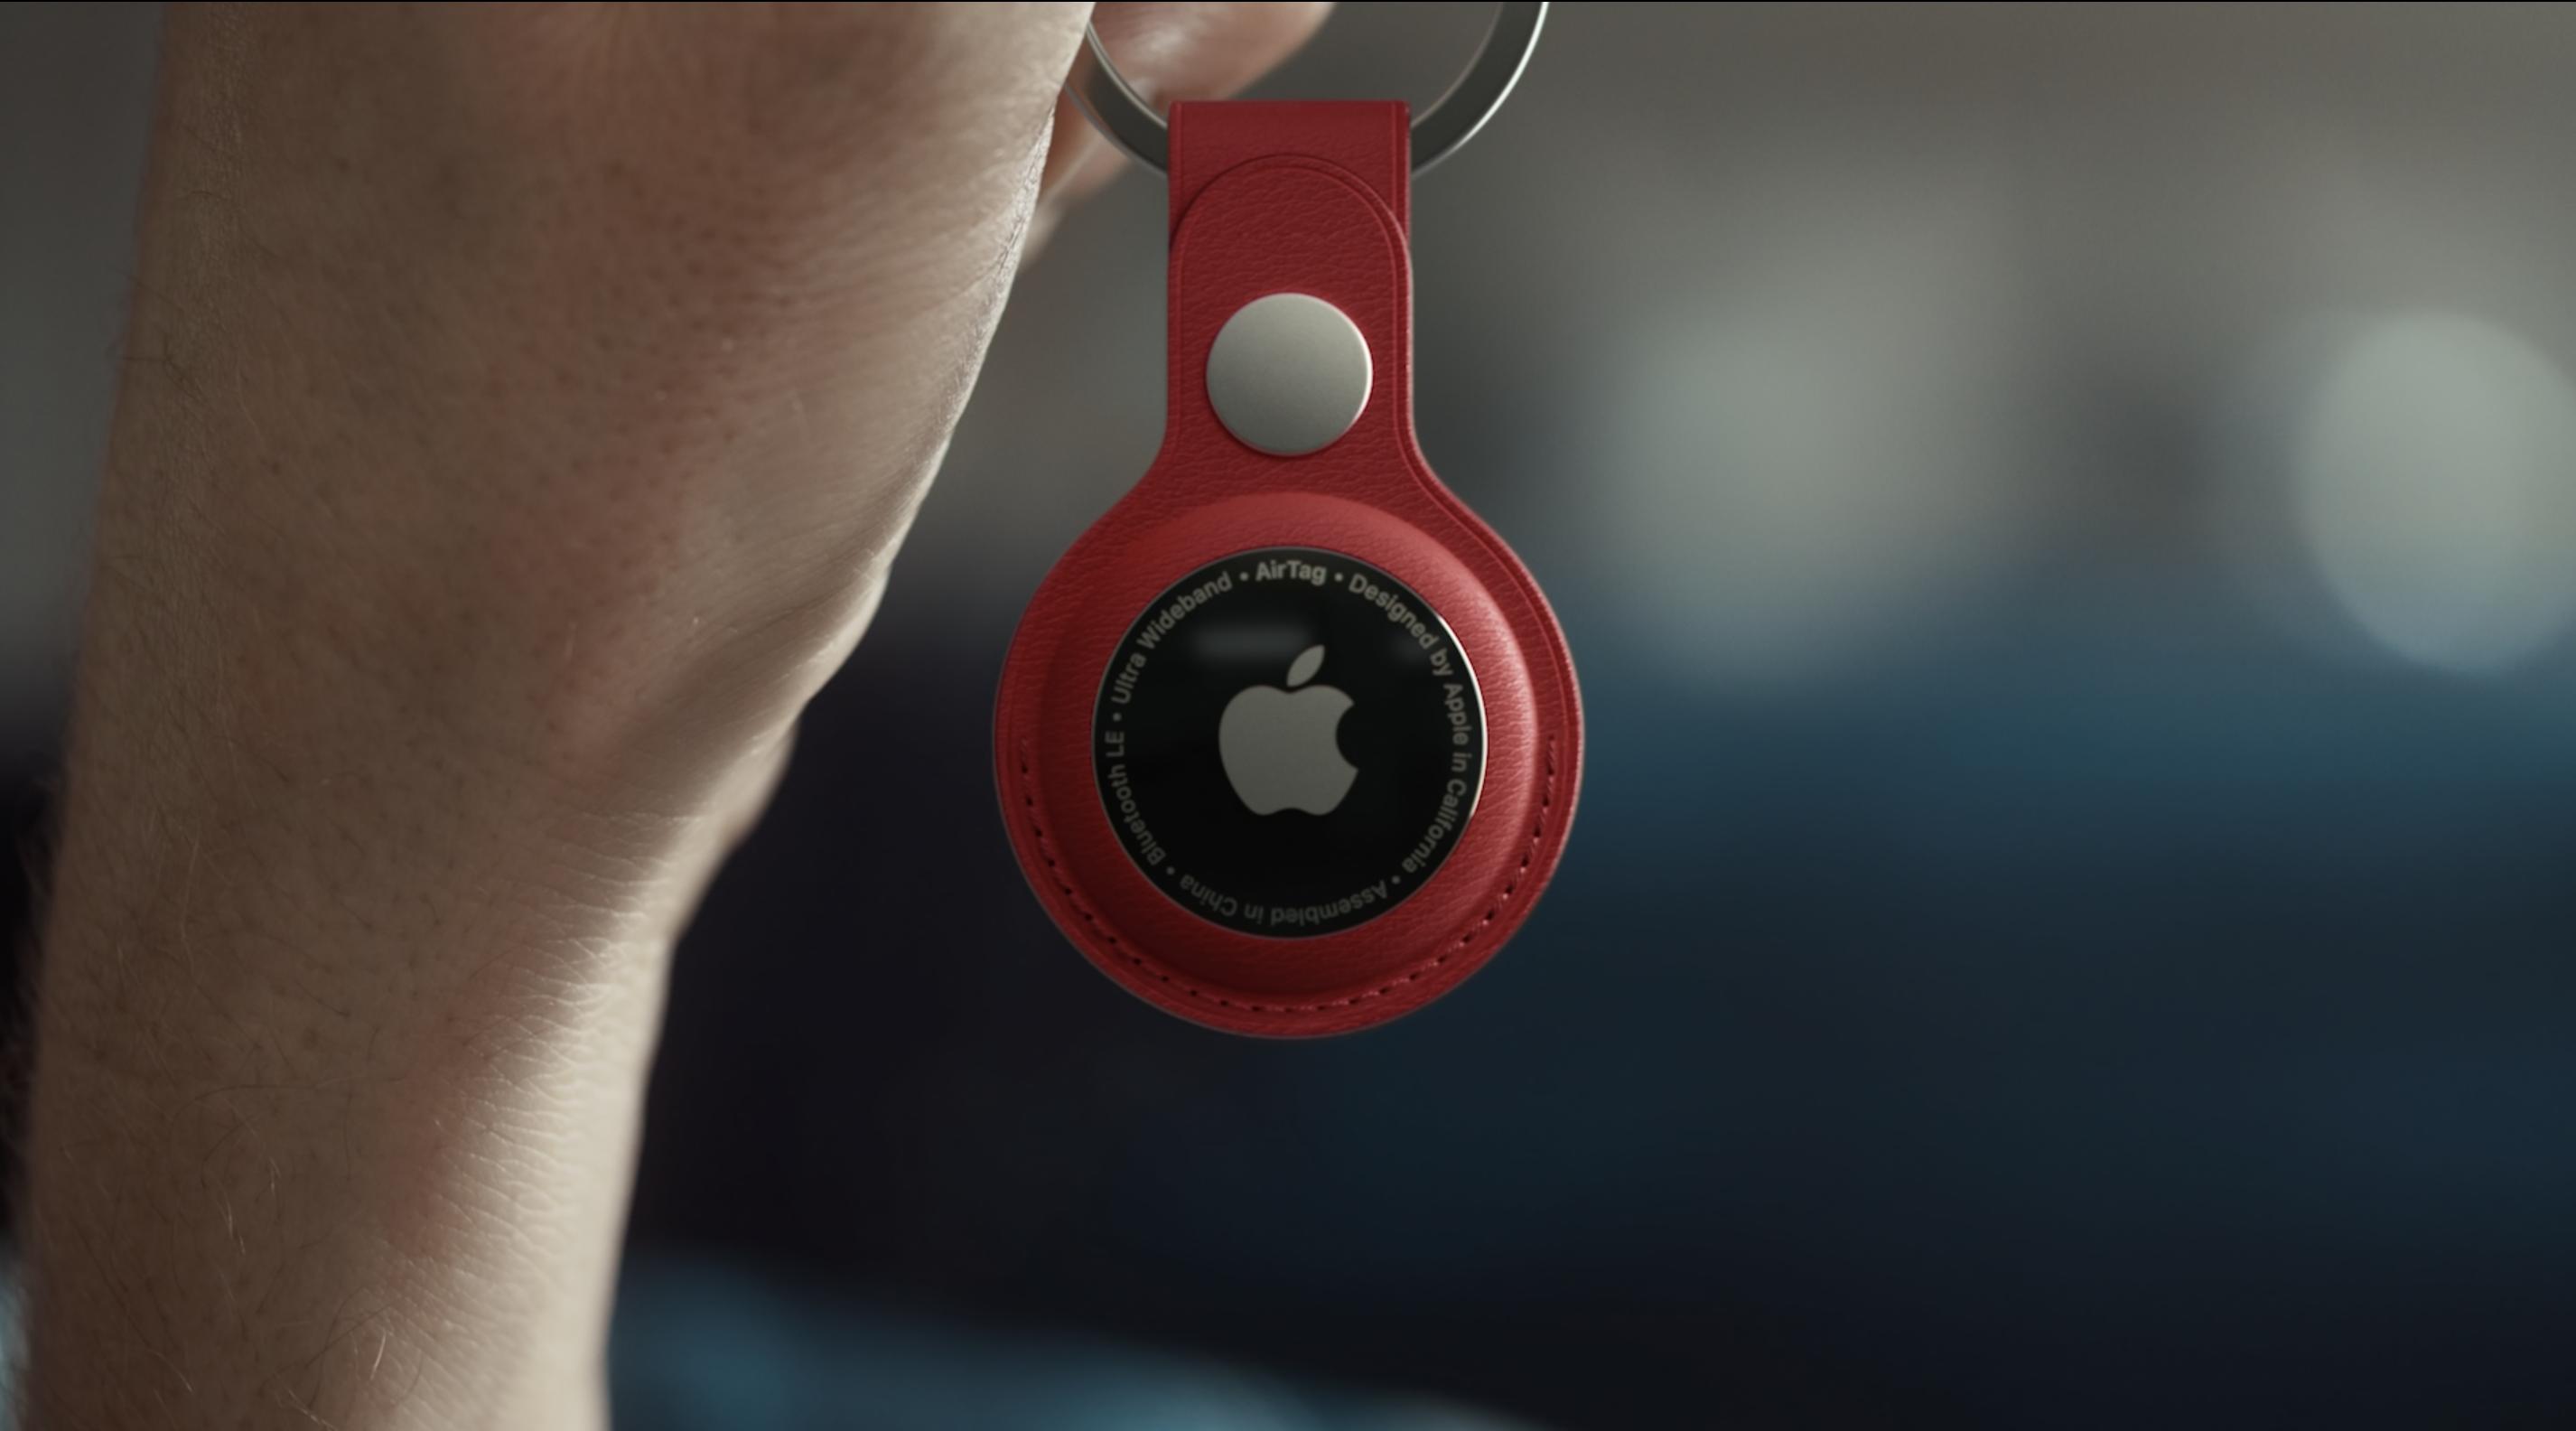 Apple unveils the long-awaited AirTag